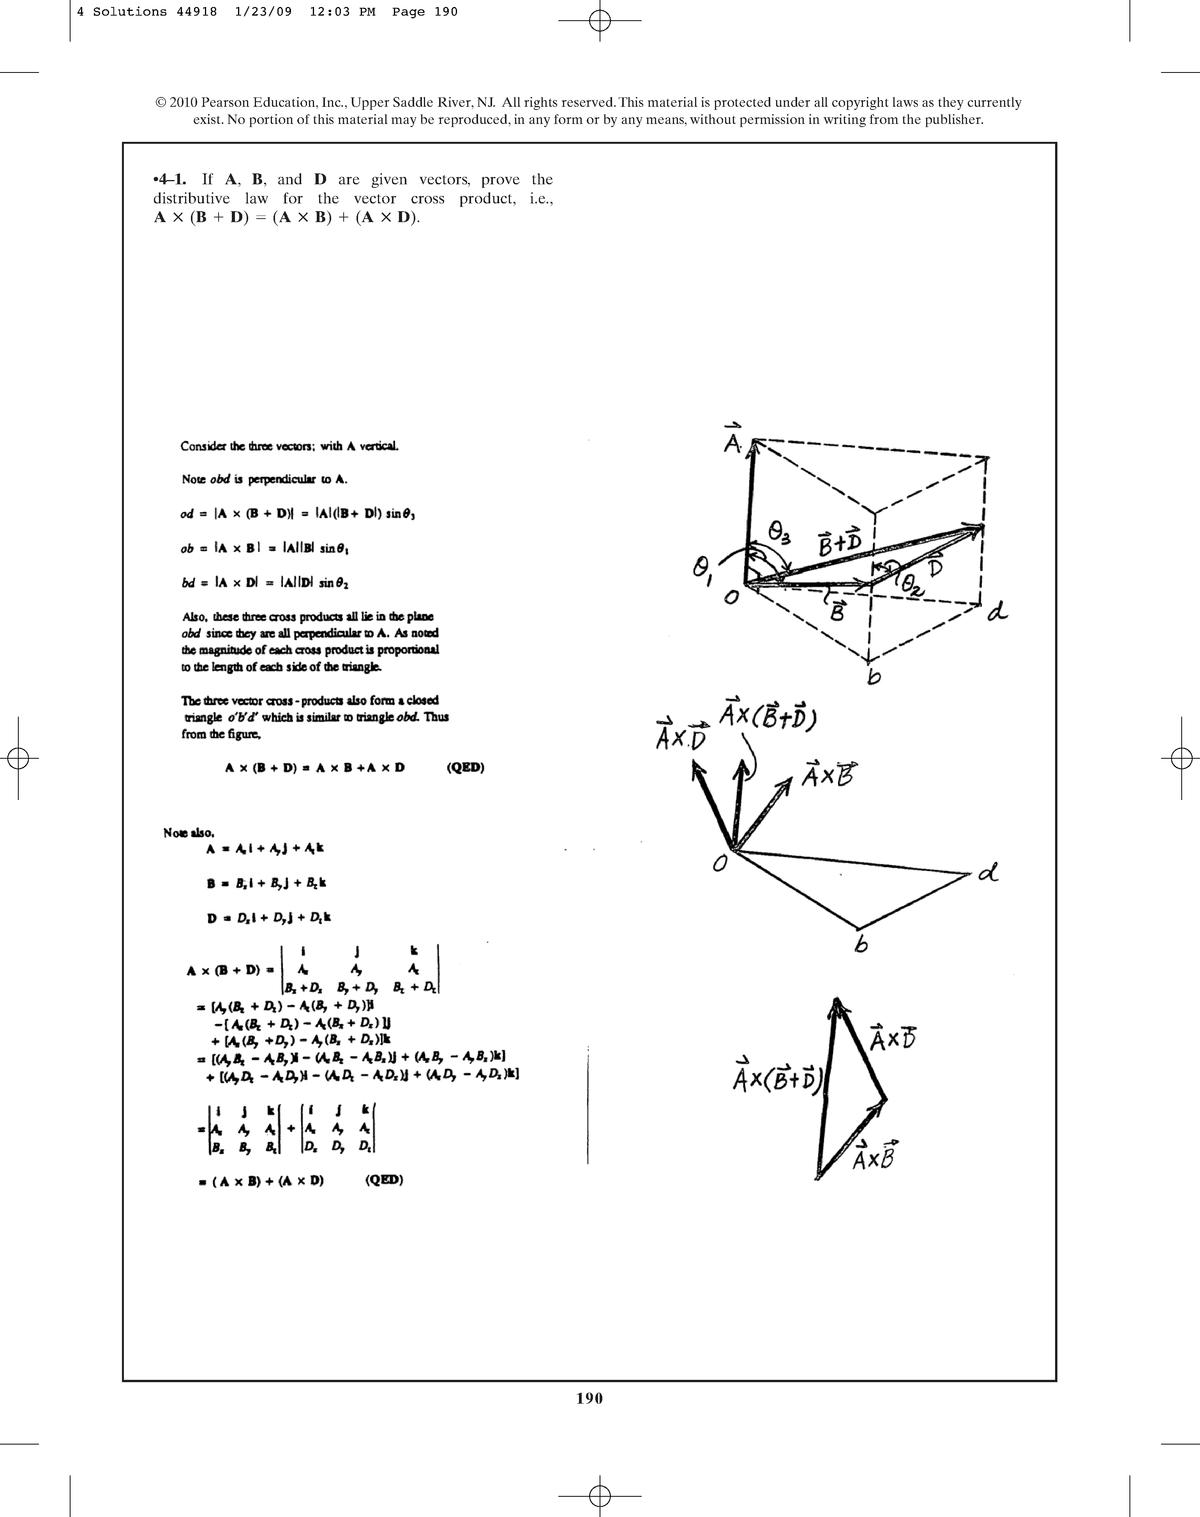 Chapter 4 Engineering Mechanics Statics R C Hibbeler 12th Edition